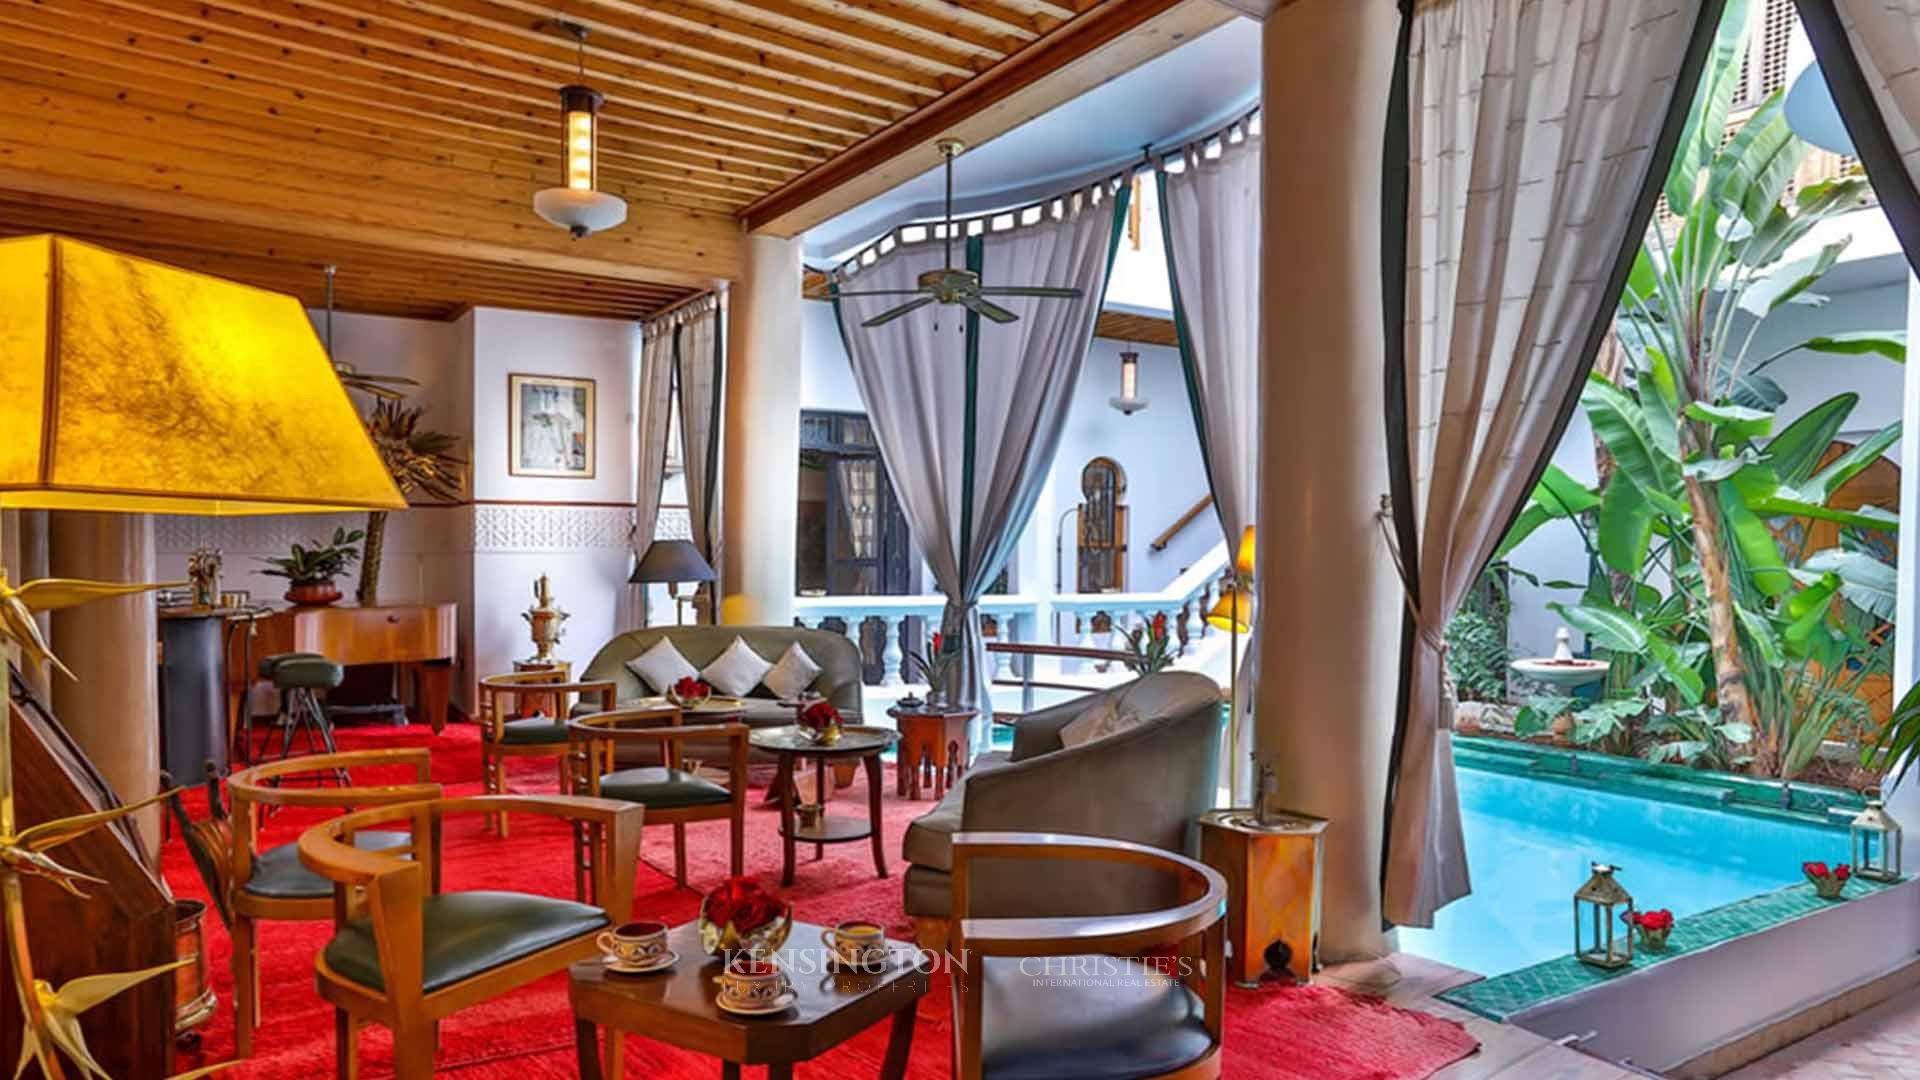 KPPM01260: Riad M Riad Marrakech Morocco